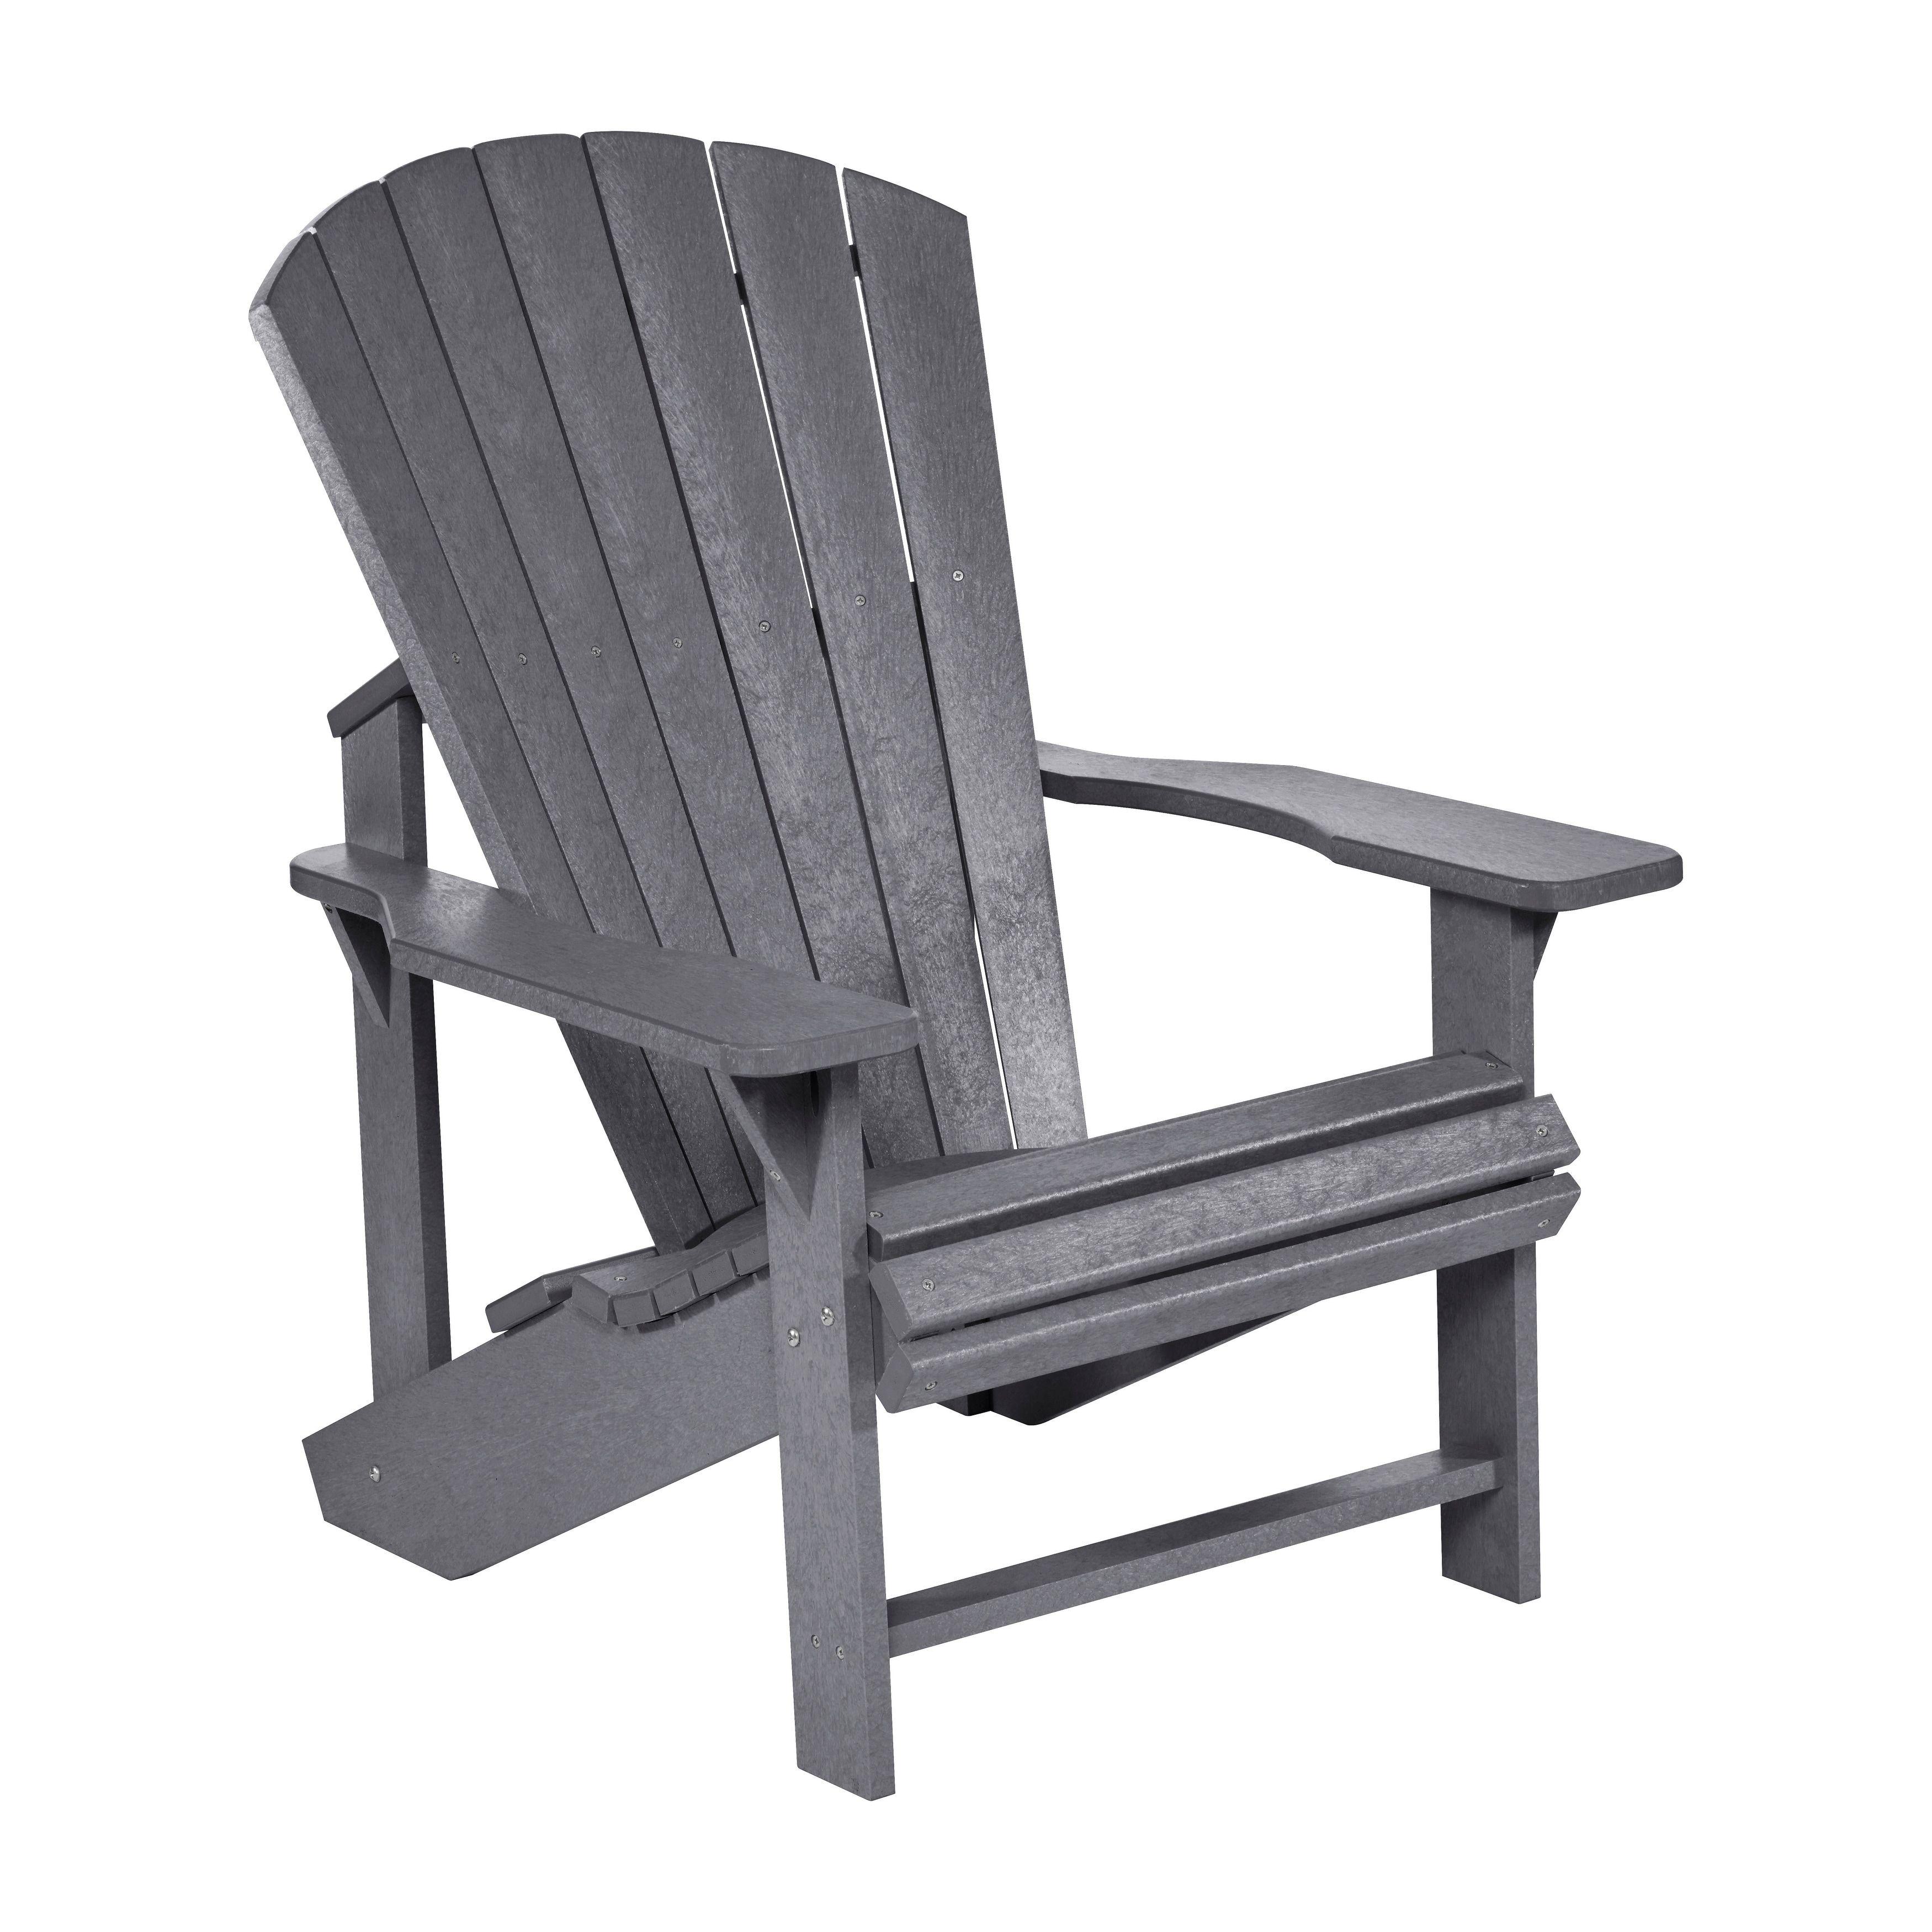 C.R. Plastics Generation Adirondack Chair (Weather